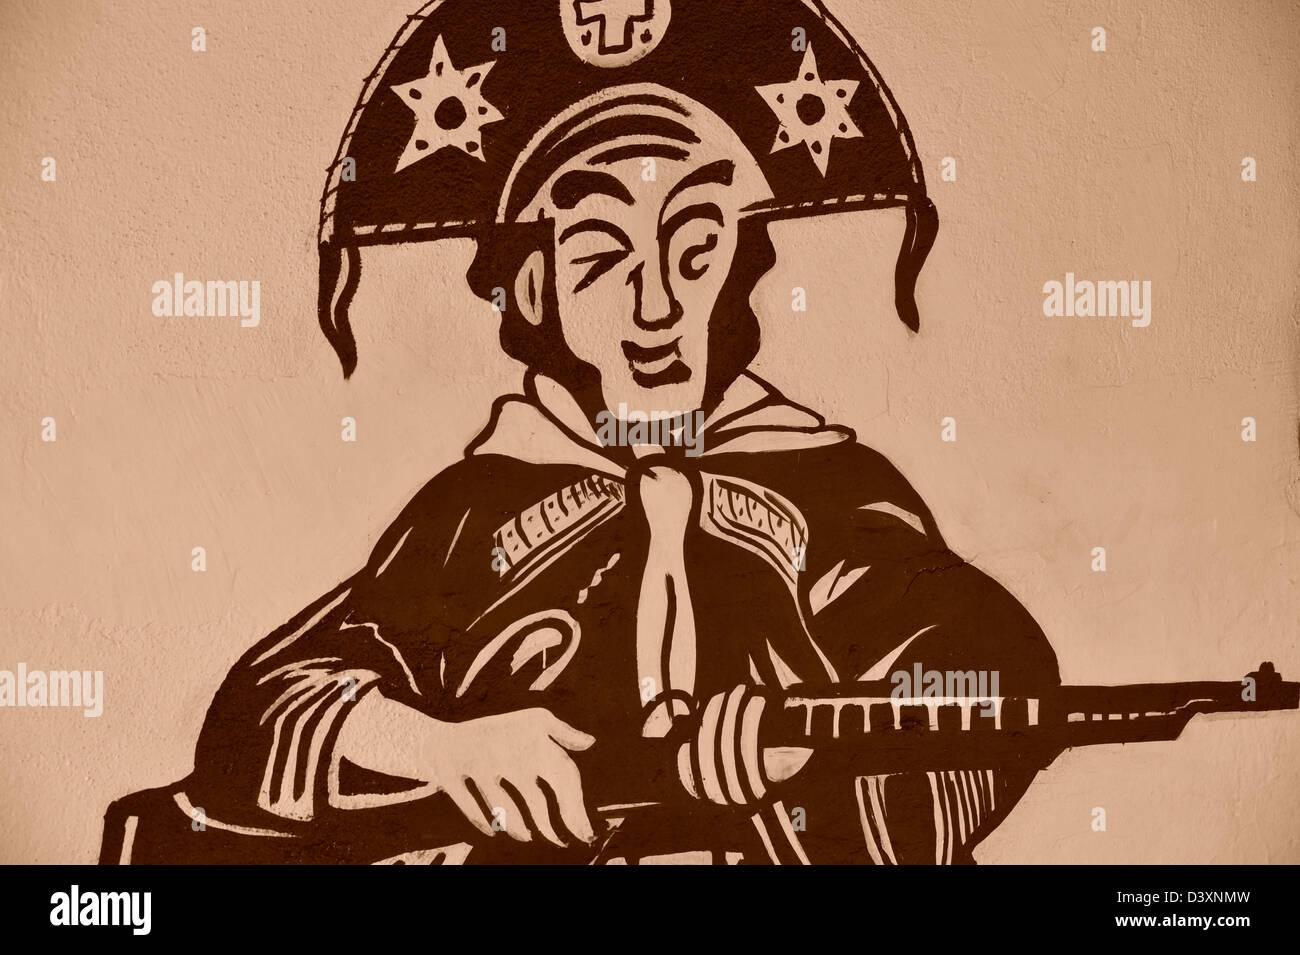 Wandgemälde des berühmten Banditen Lampiáo - Held des brasilianischen Nordostens - Stock Image